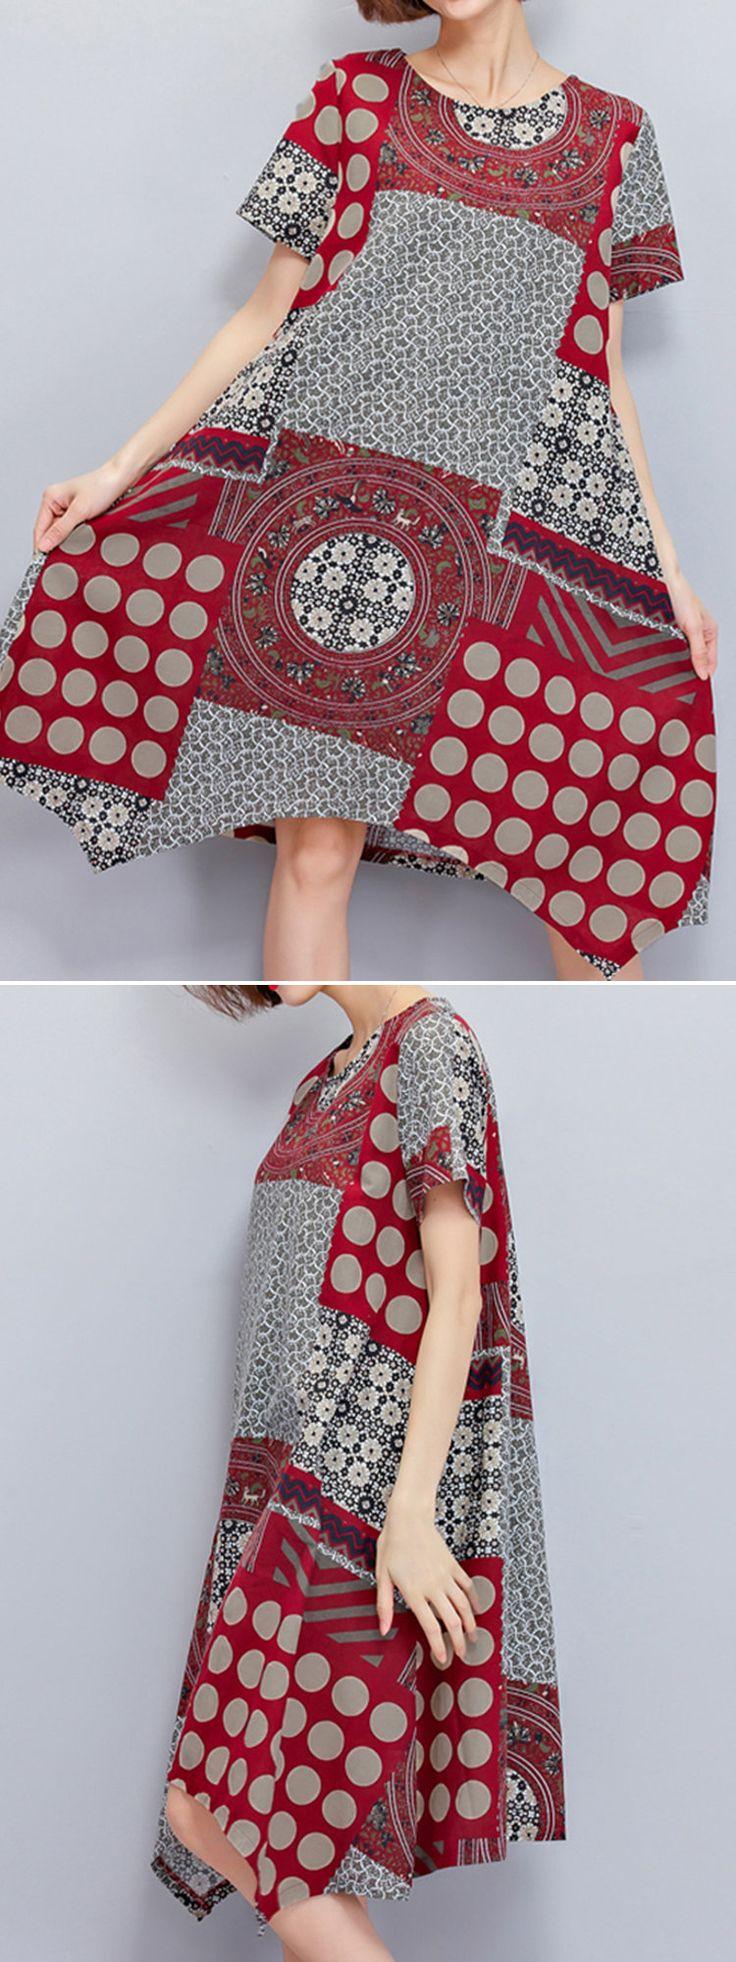 US$ 18.32 Ethnic Printed Irregular Hem Short Sleeve Vintage Dresses